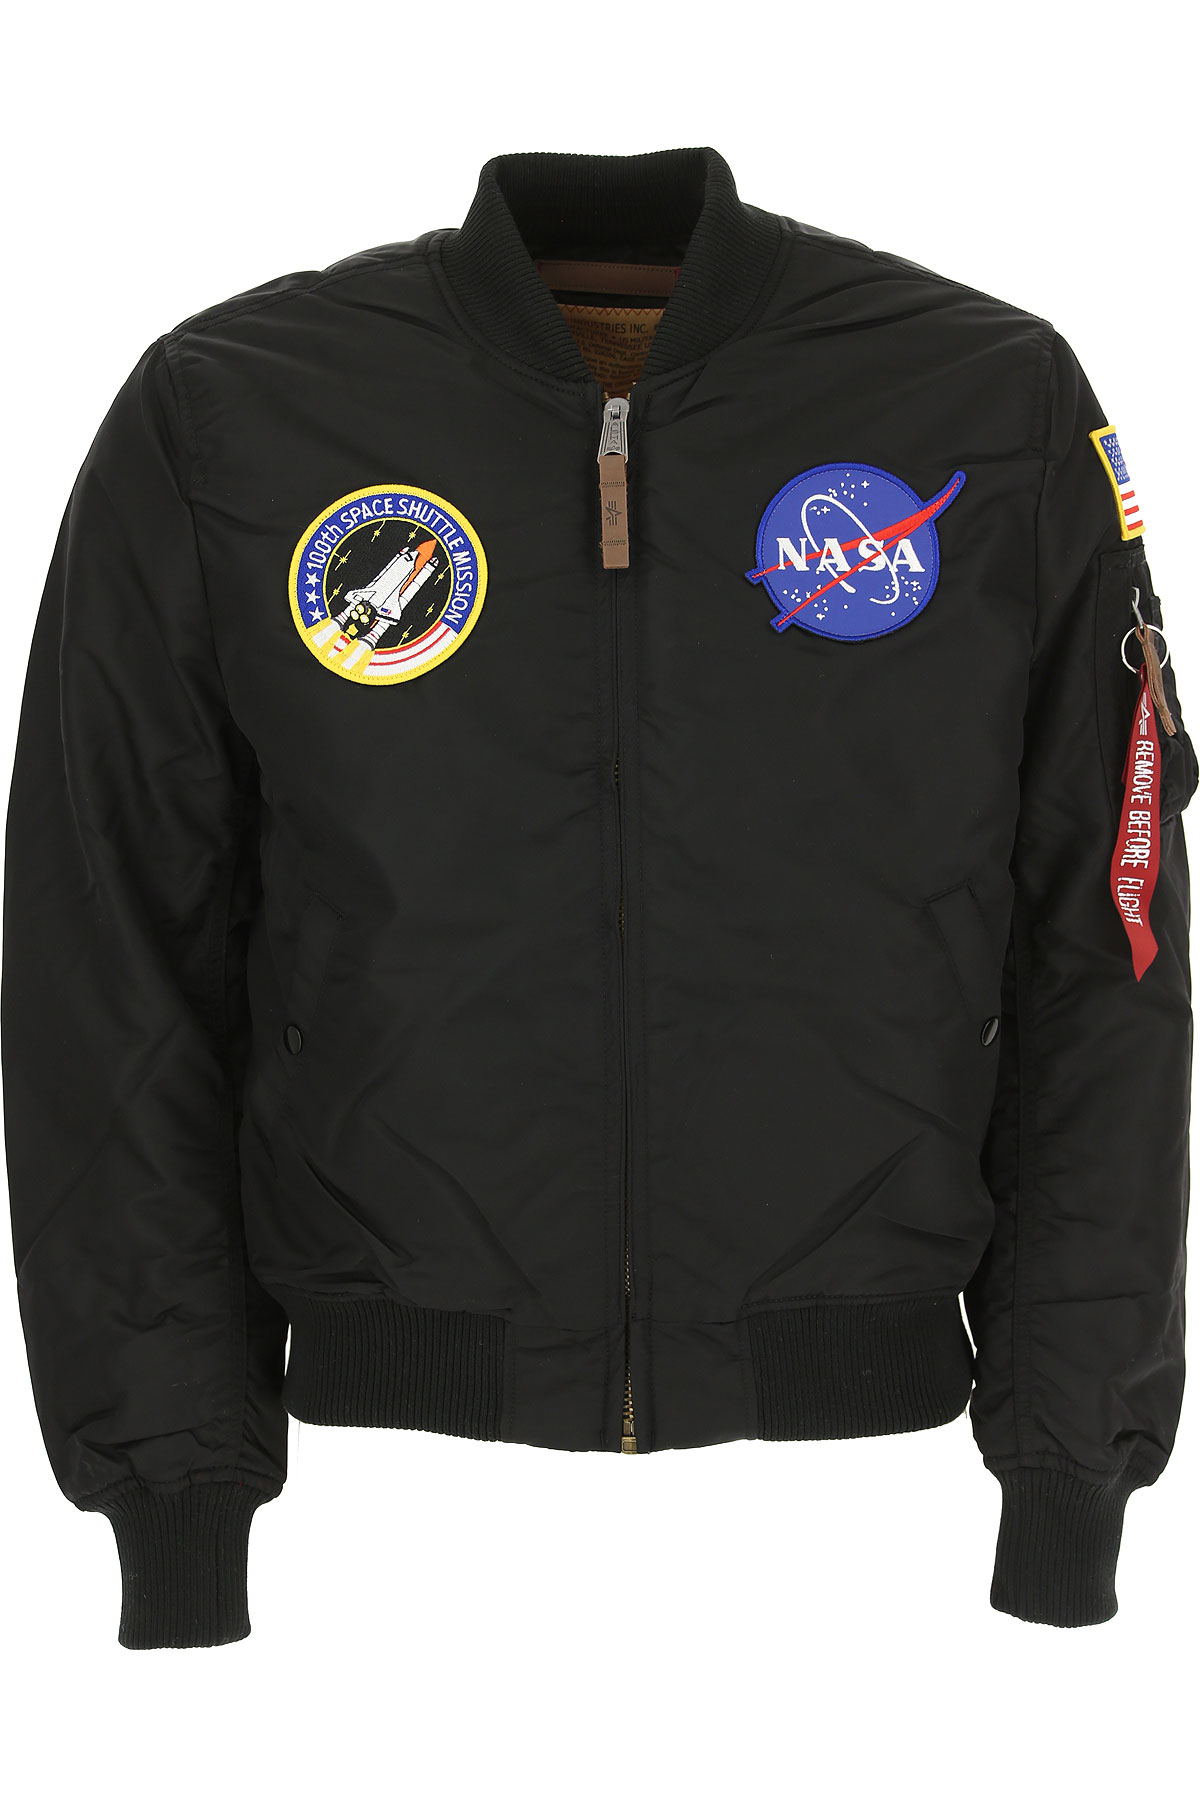 Image of Alpha Industries Jacket for Men, Black, polyester, 2017, L M S XL XXL